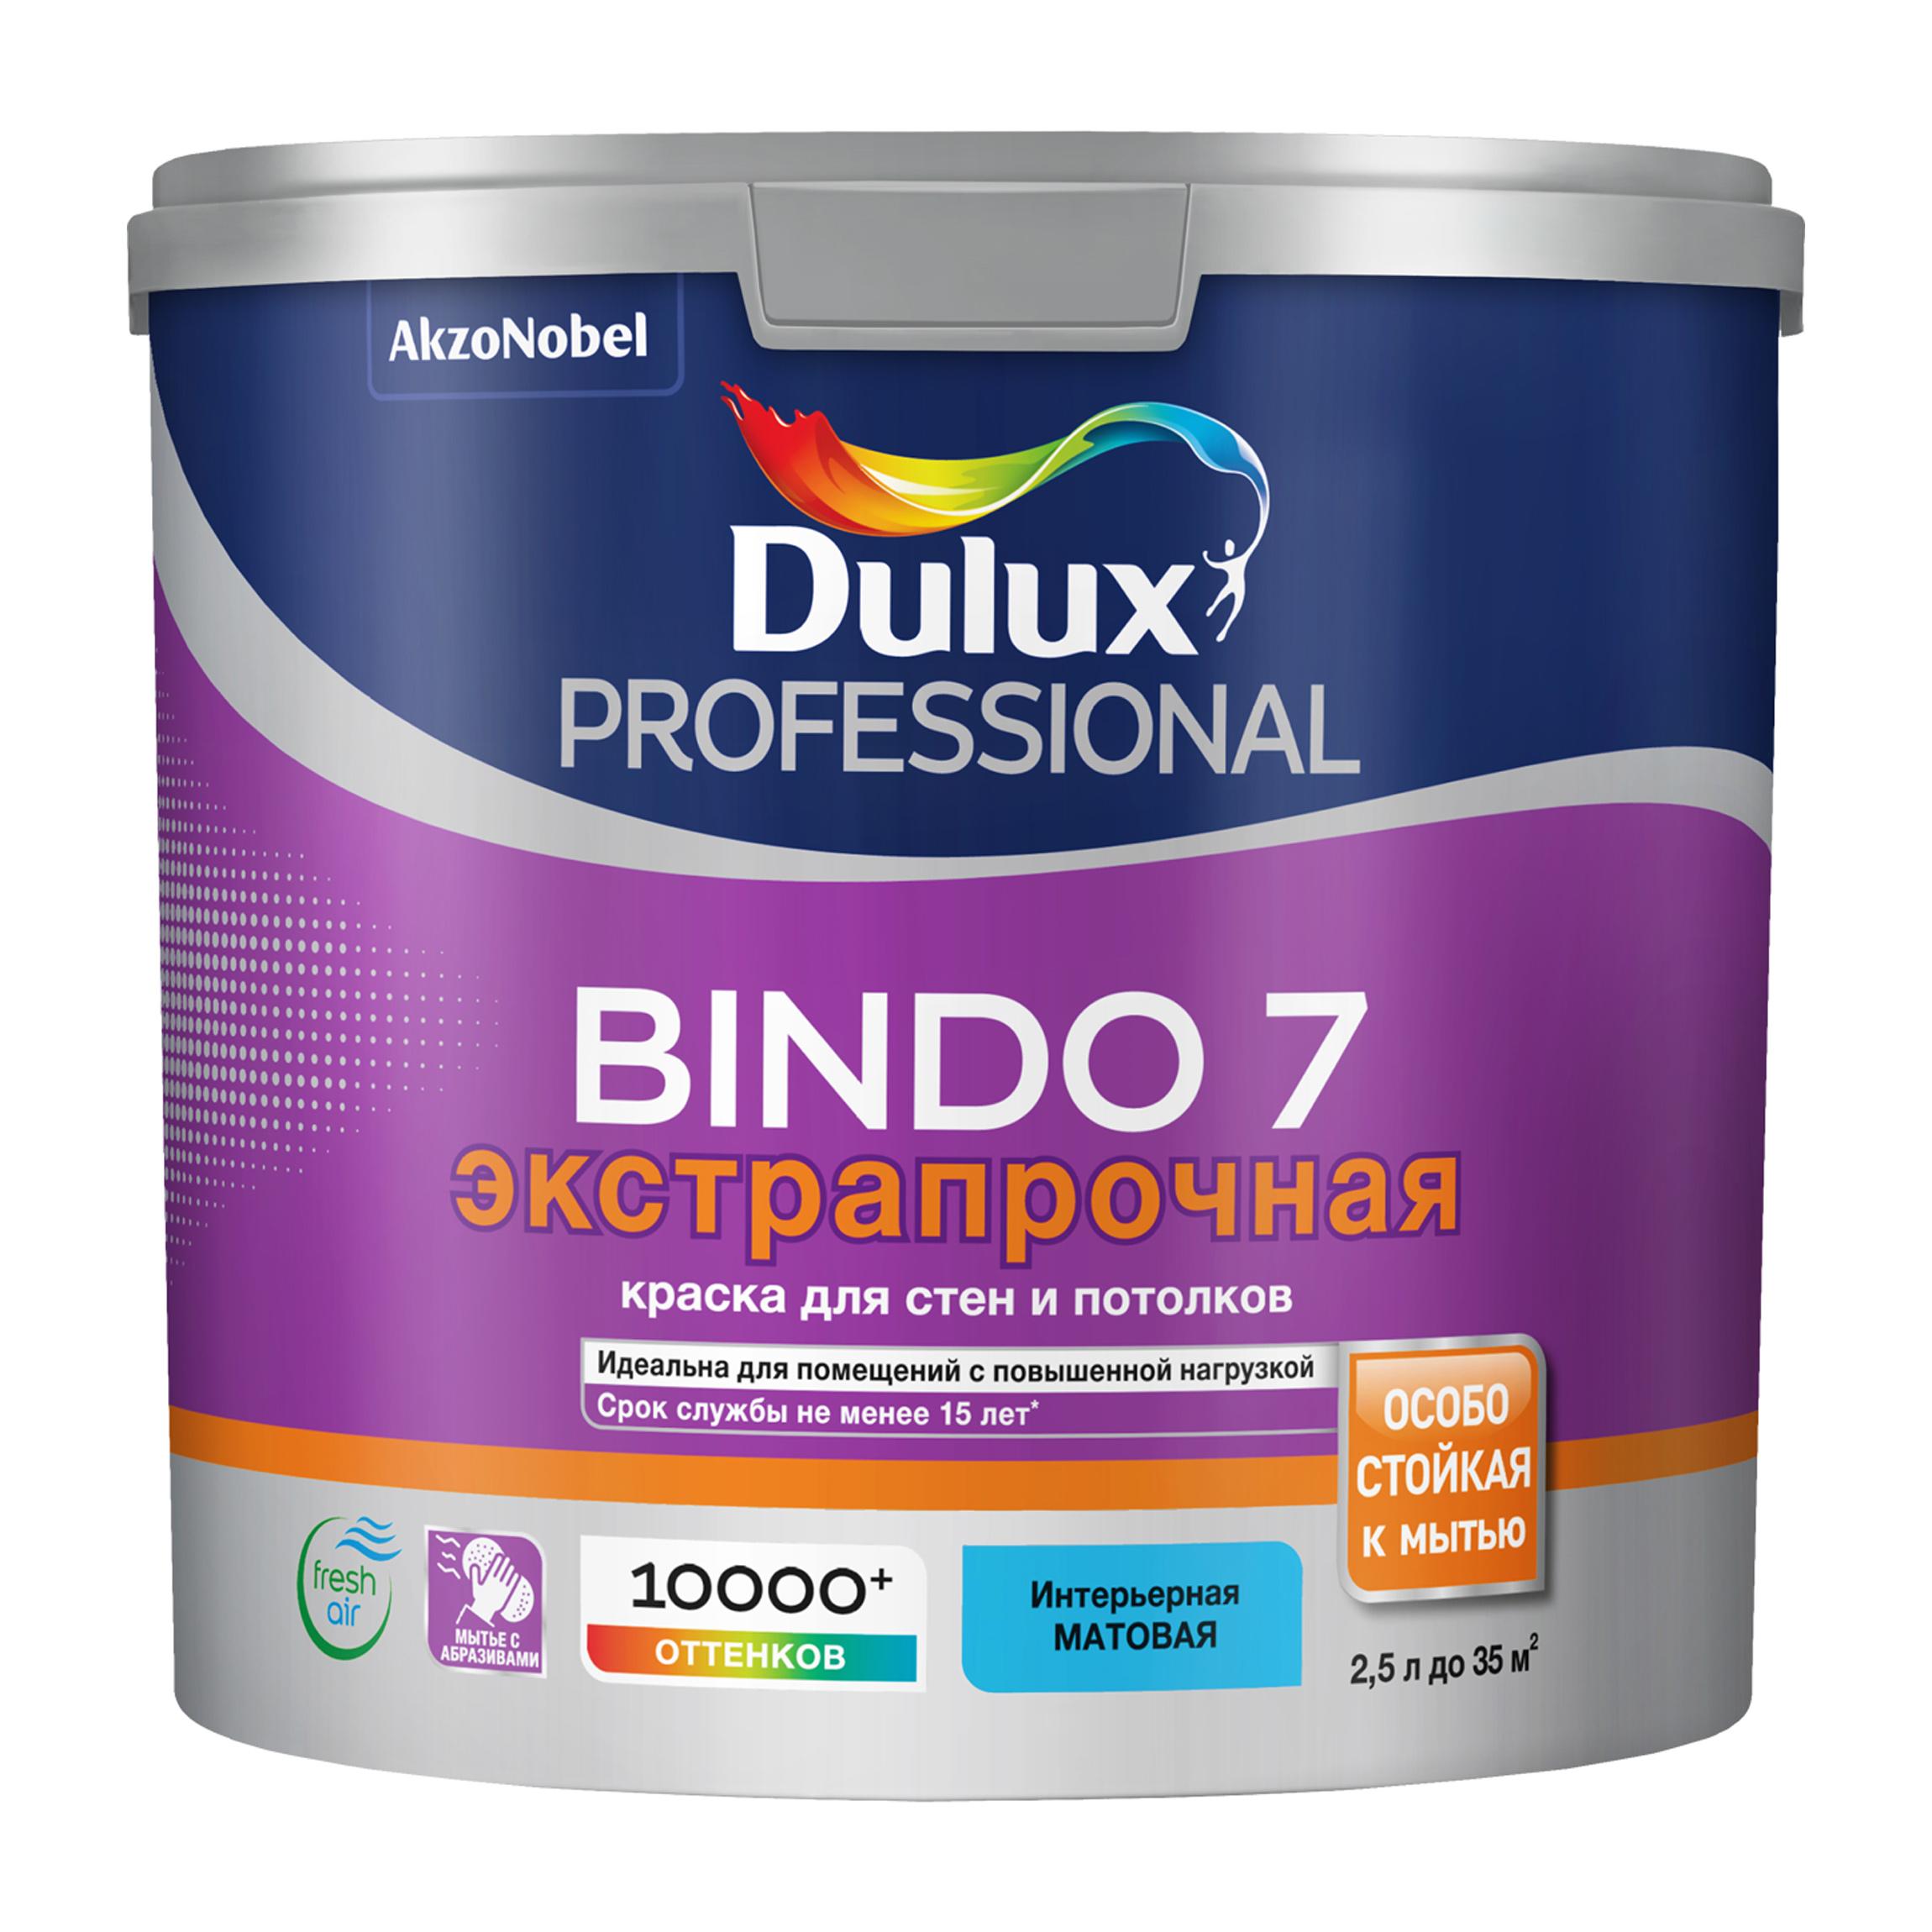 Фото - Краска для стен и потолков латексная экстрапрочная Dulux Professional Bindo 7 матовая база BW 2,5 л. краска водно дисперсионная dulux bindo 7 экстрапрочная моющаяся основа вс 1 л